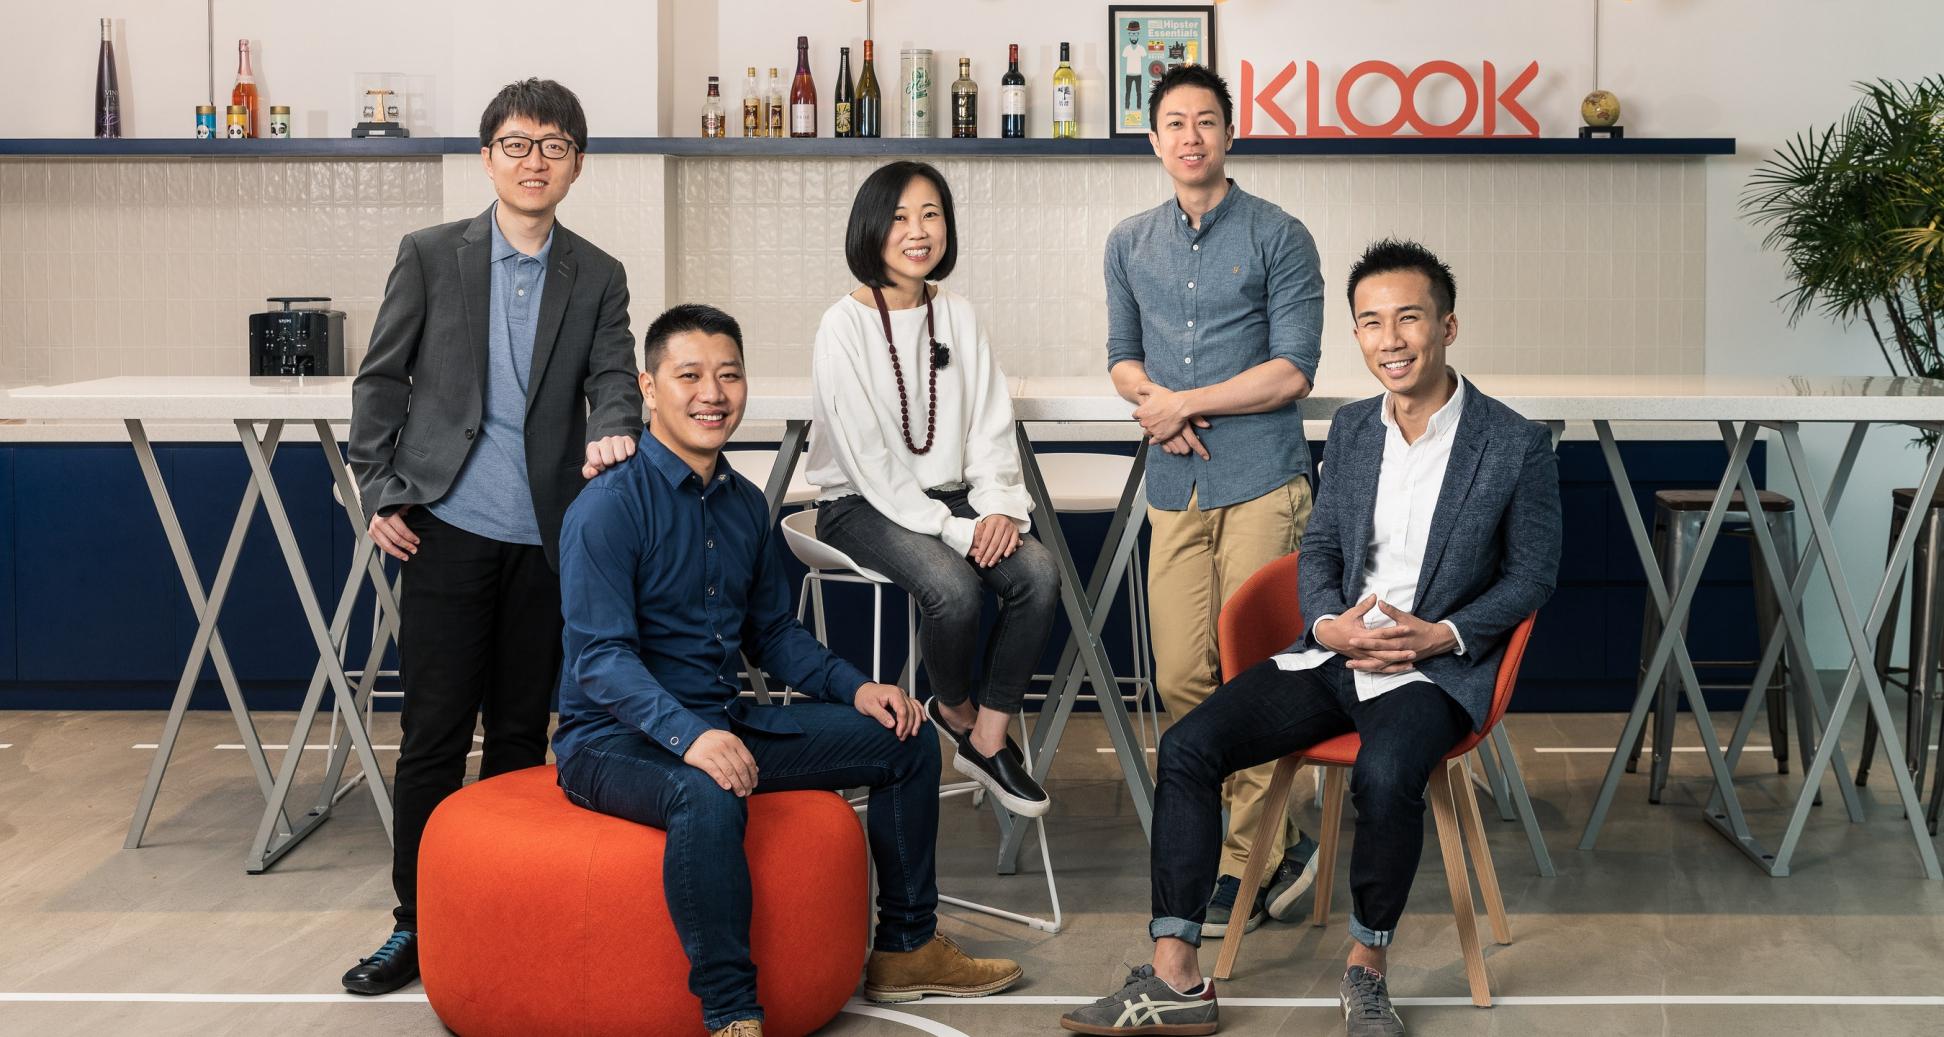 Travel activities platform Klook raises $225M led by SoftBank's Vision Fund – TechCrunch 1